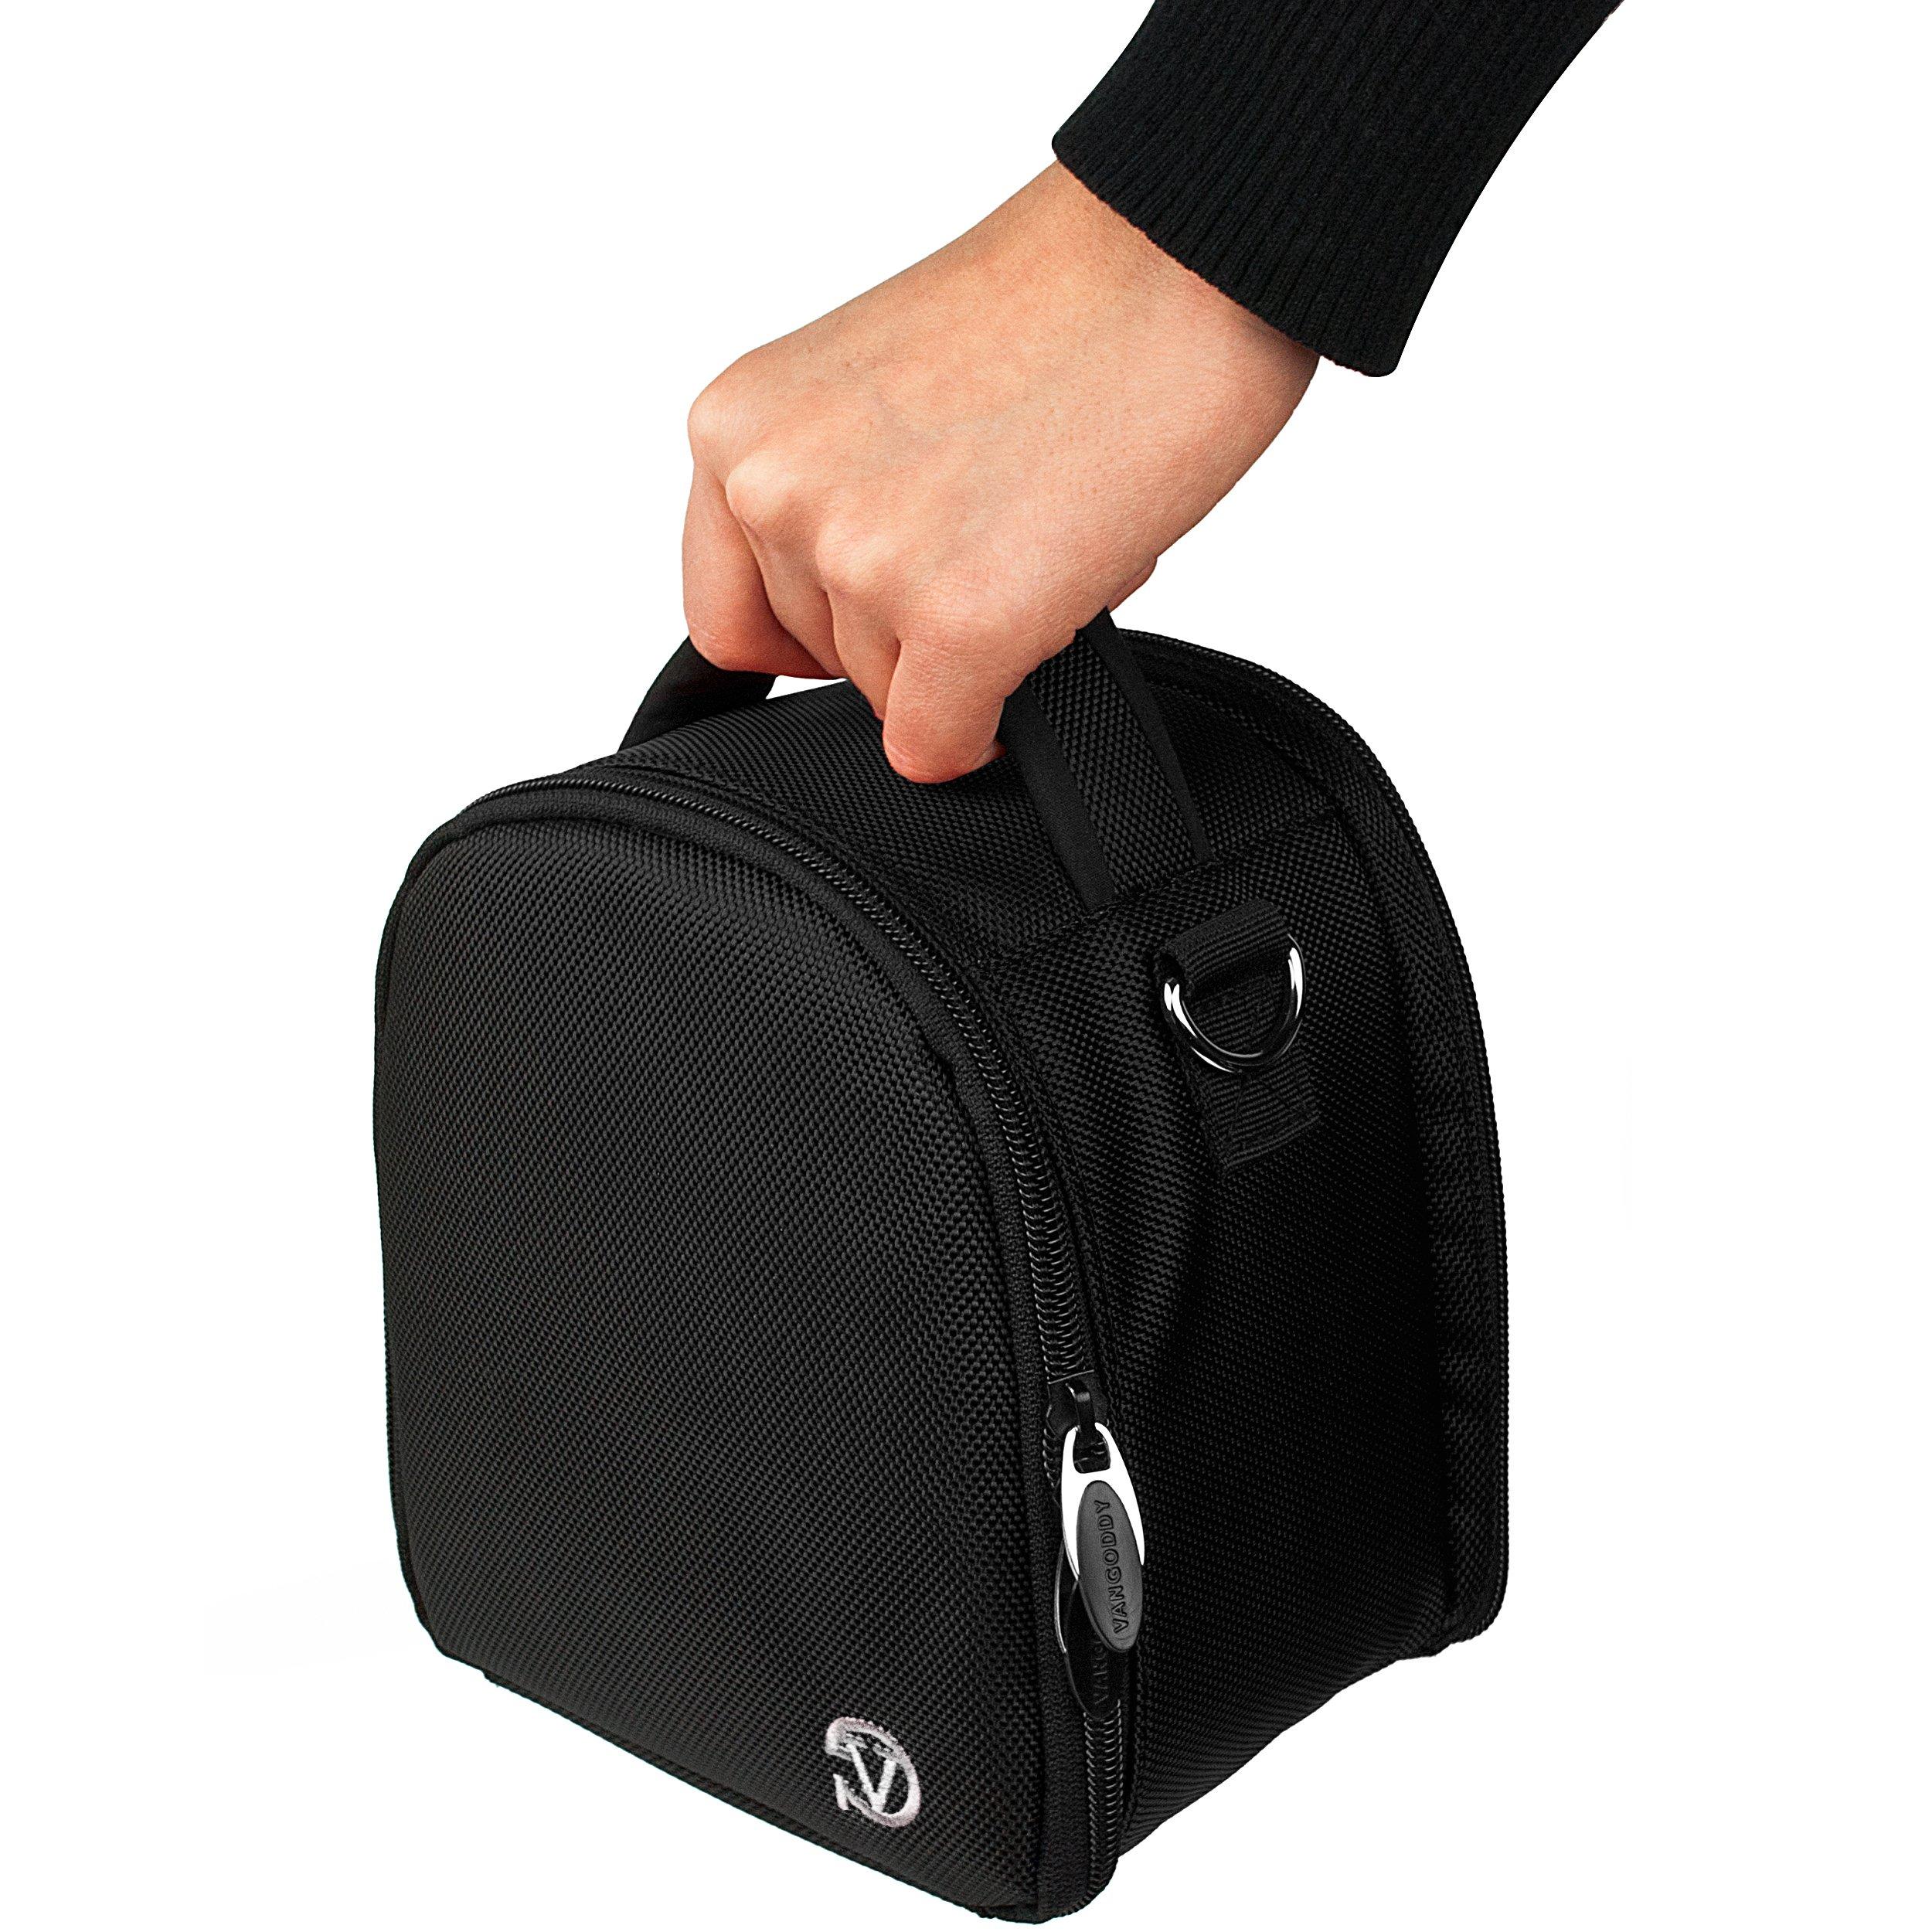 VanGoddy Laurel Carrying Handbag for Fujifilm FinePix S9800 Digital Camera by Vangoddy (Image #1)